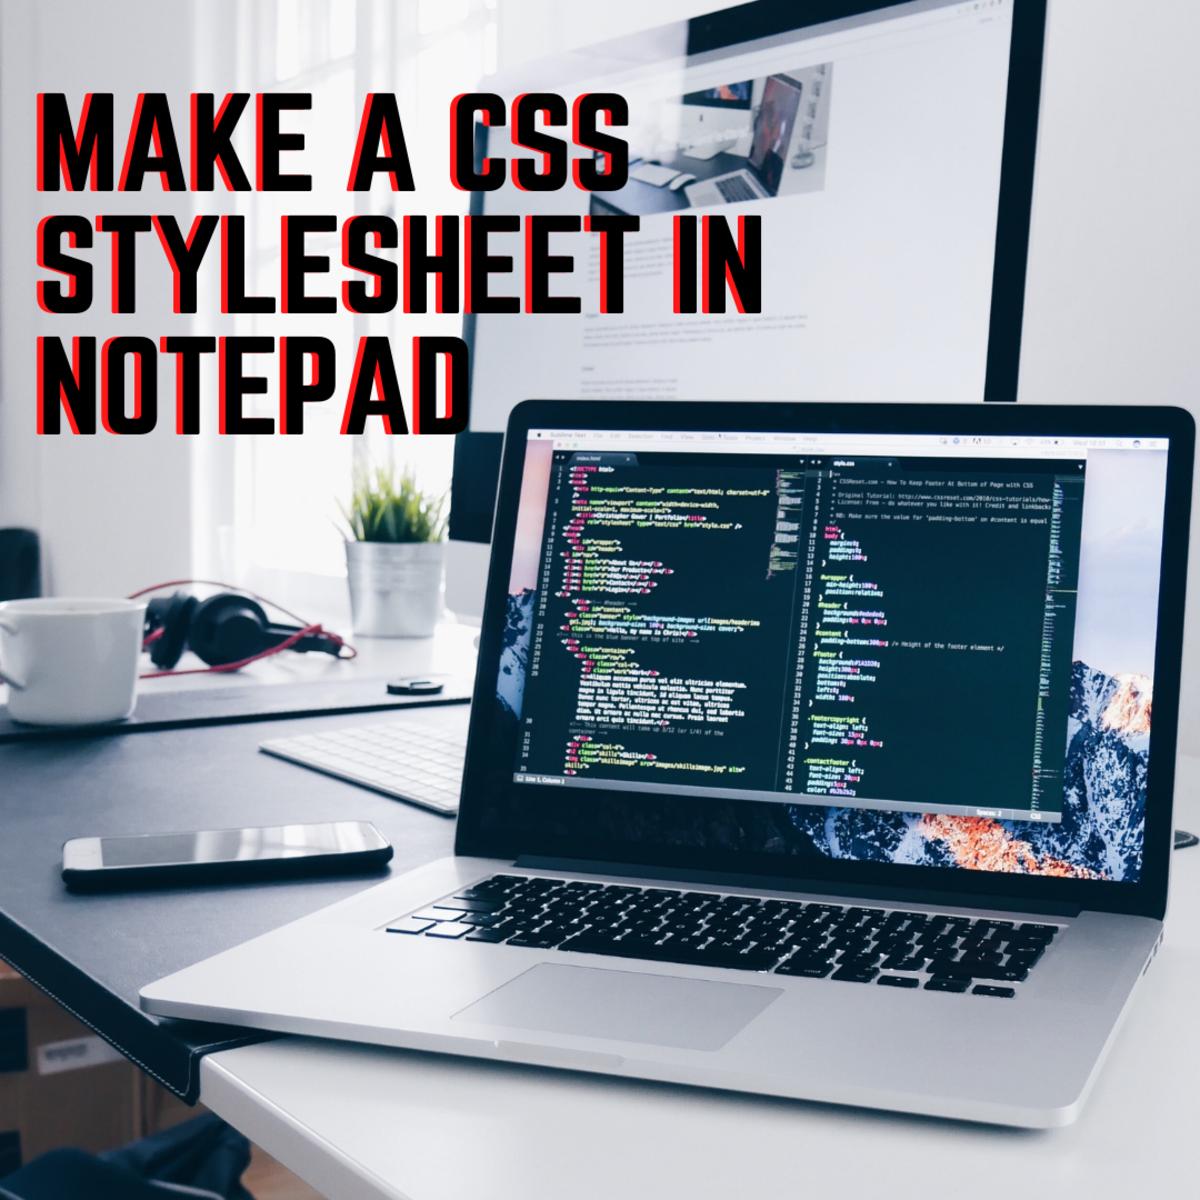 Mak a CSS Stylesheet in Notepad